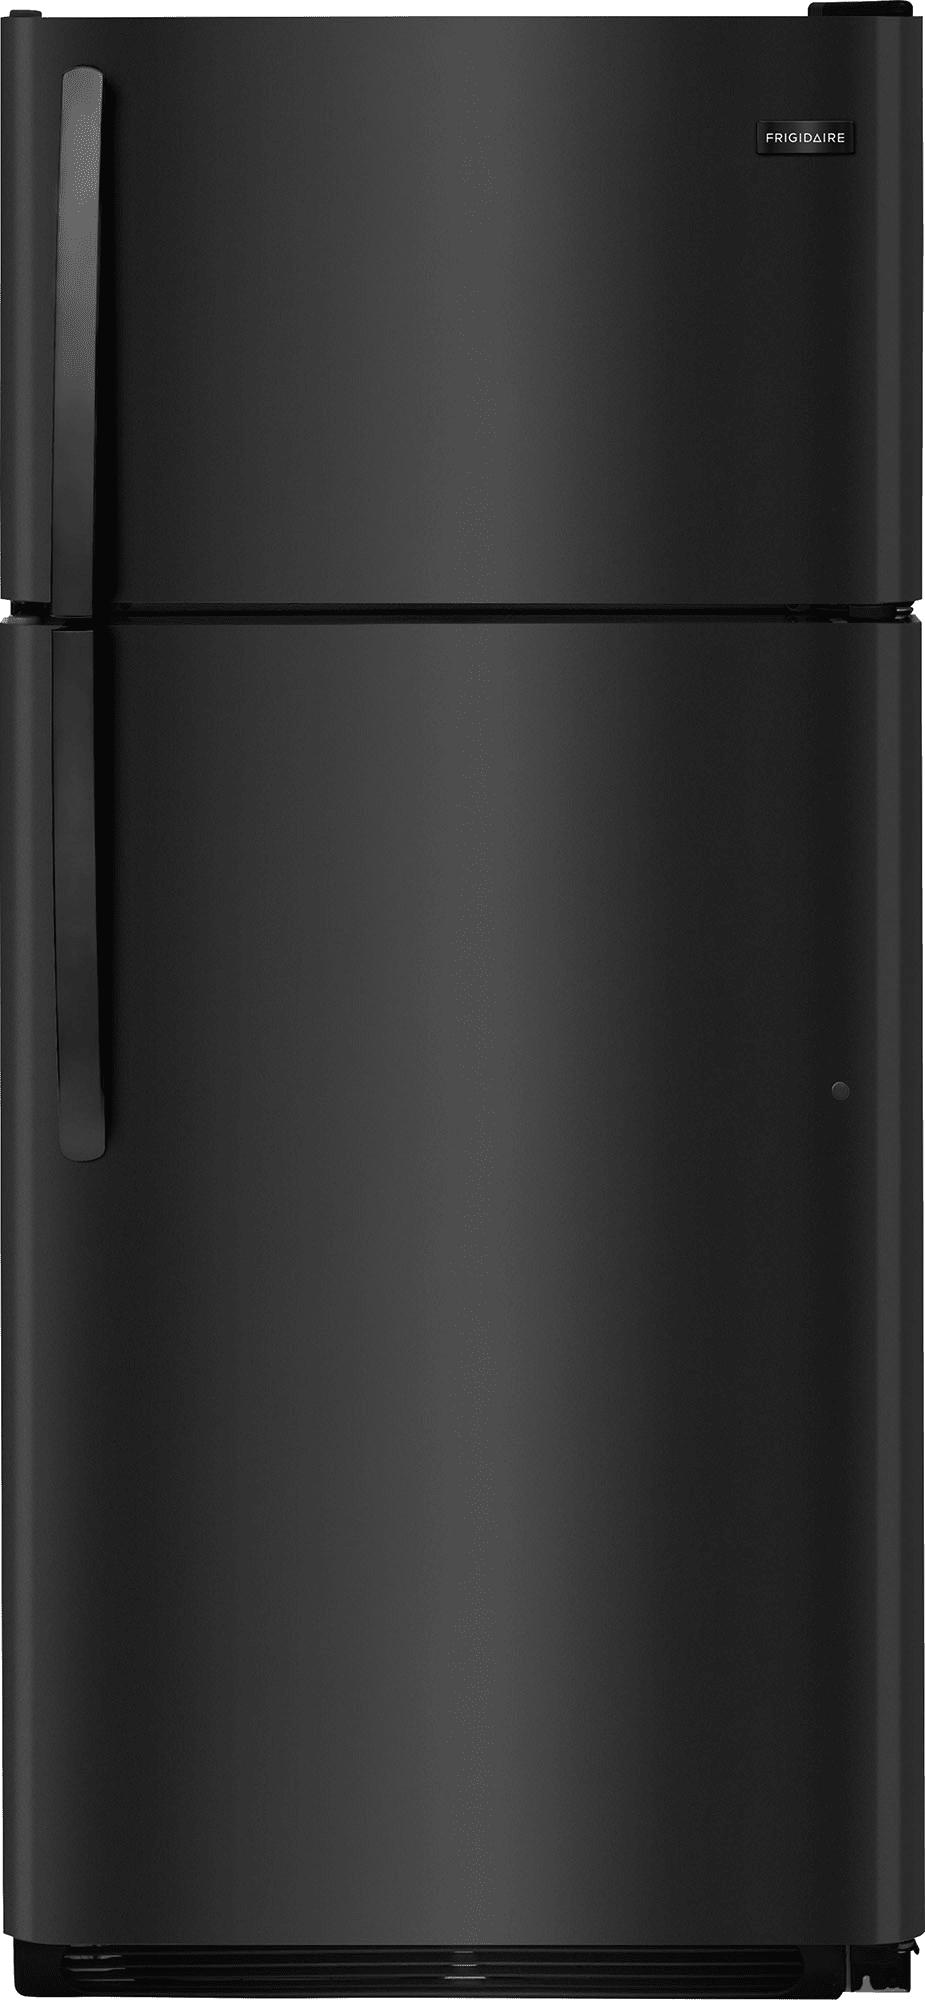 Frigidaire Fftr1814tb 30 Inch Top Freezer Refrigerator